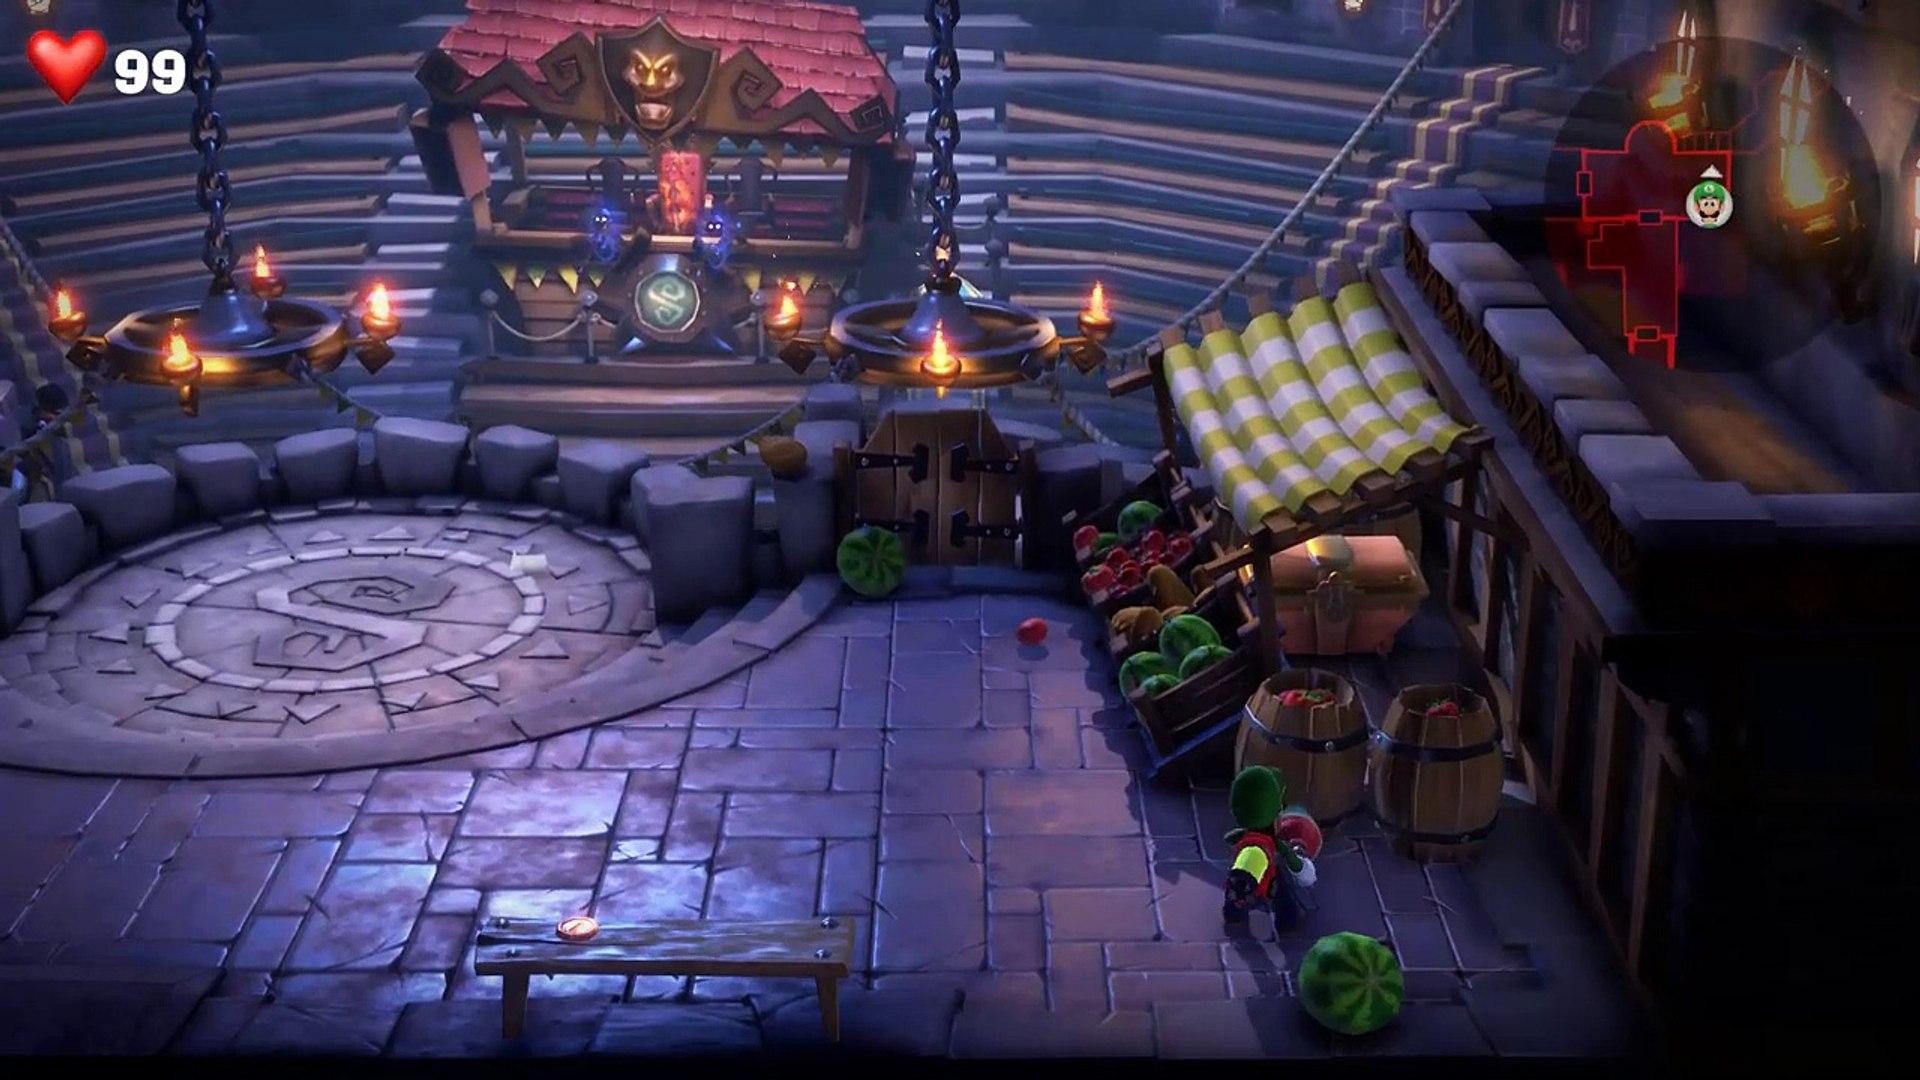 Luigi S Mansion 3 Walkthrough Gameplay Part 7 Castle Macfrights Boss Battle